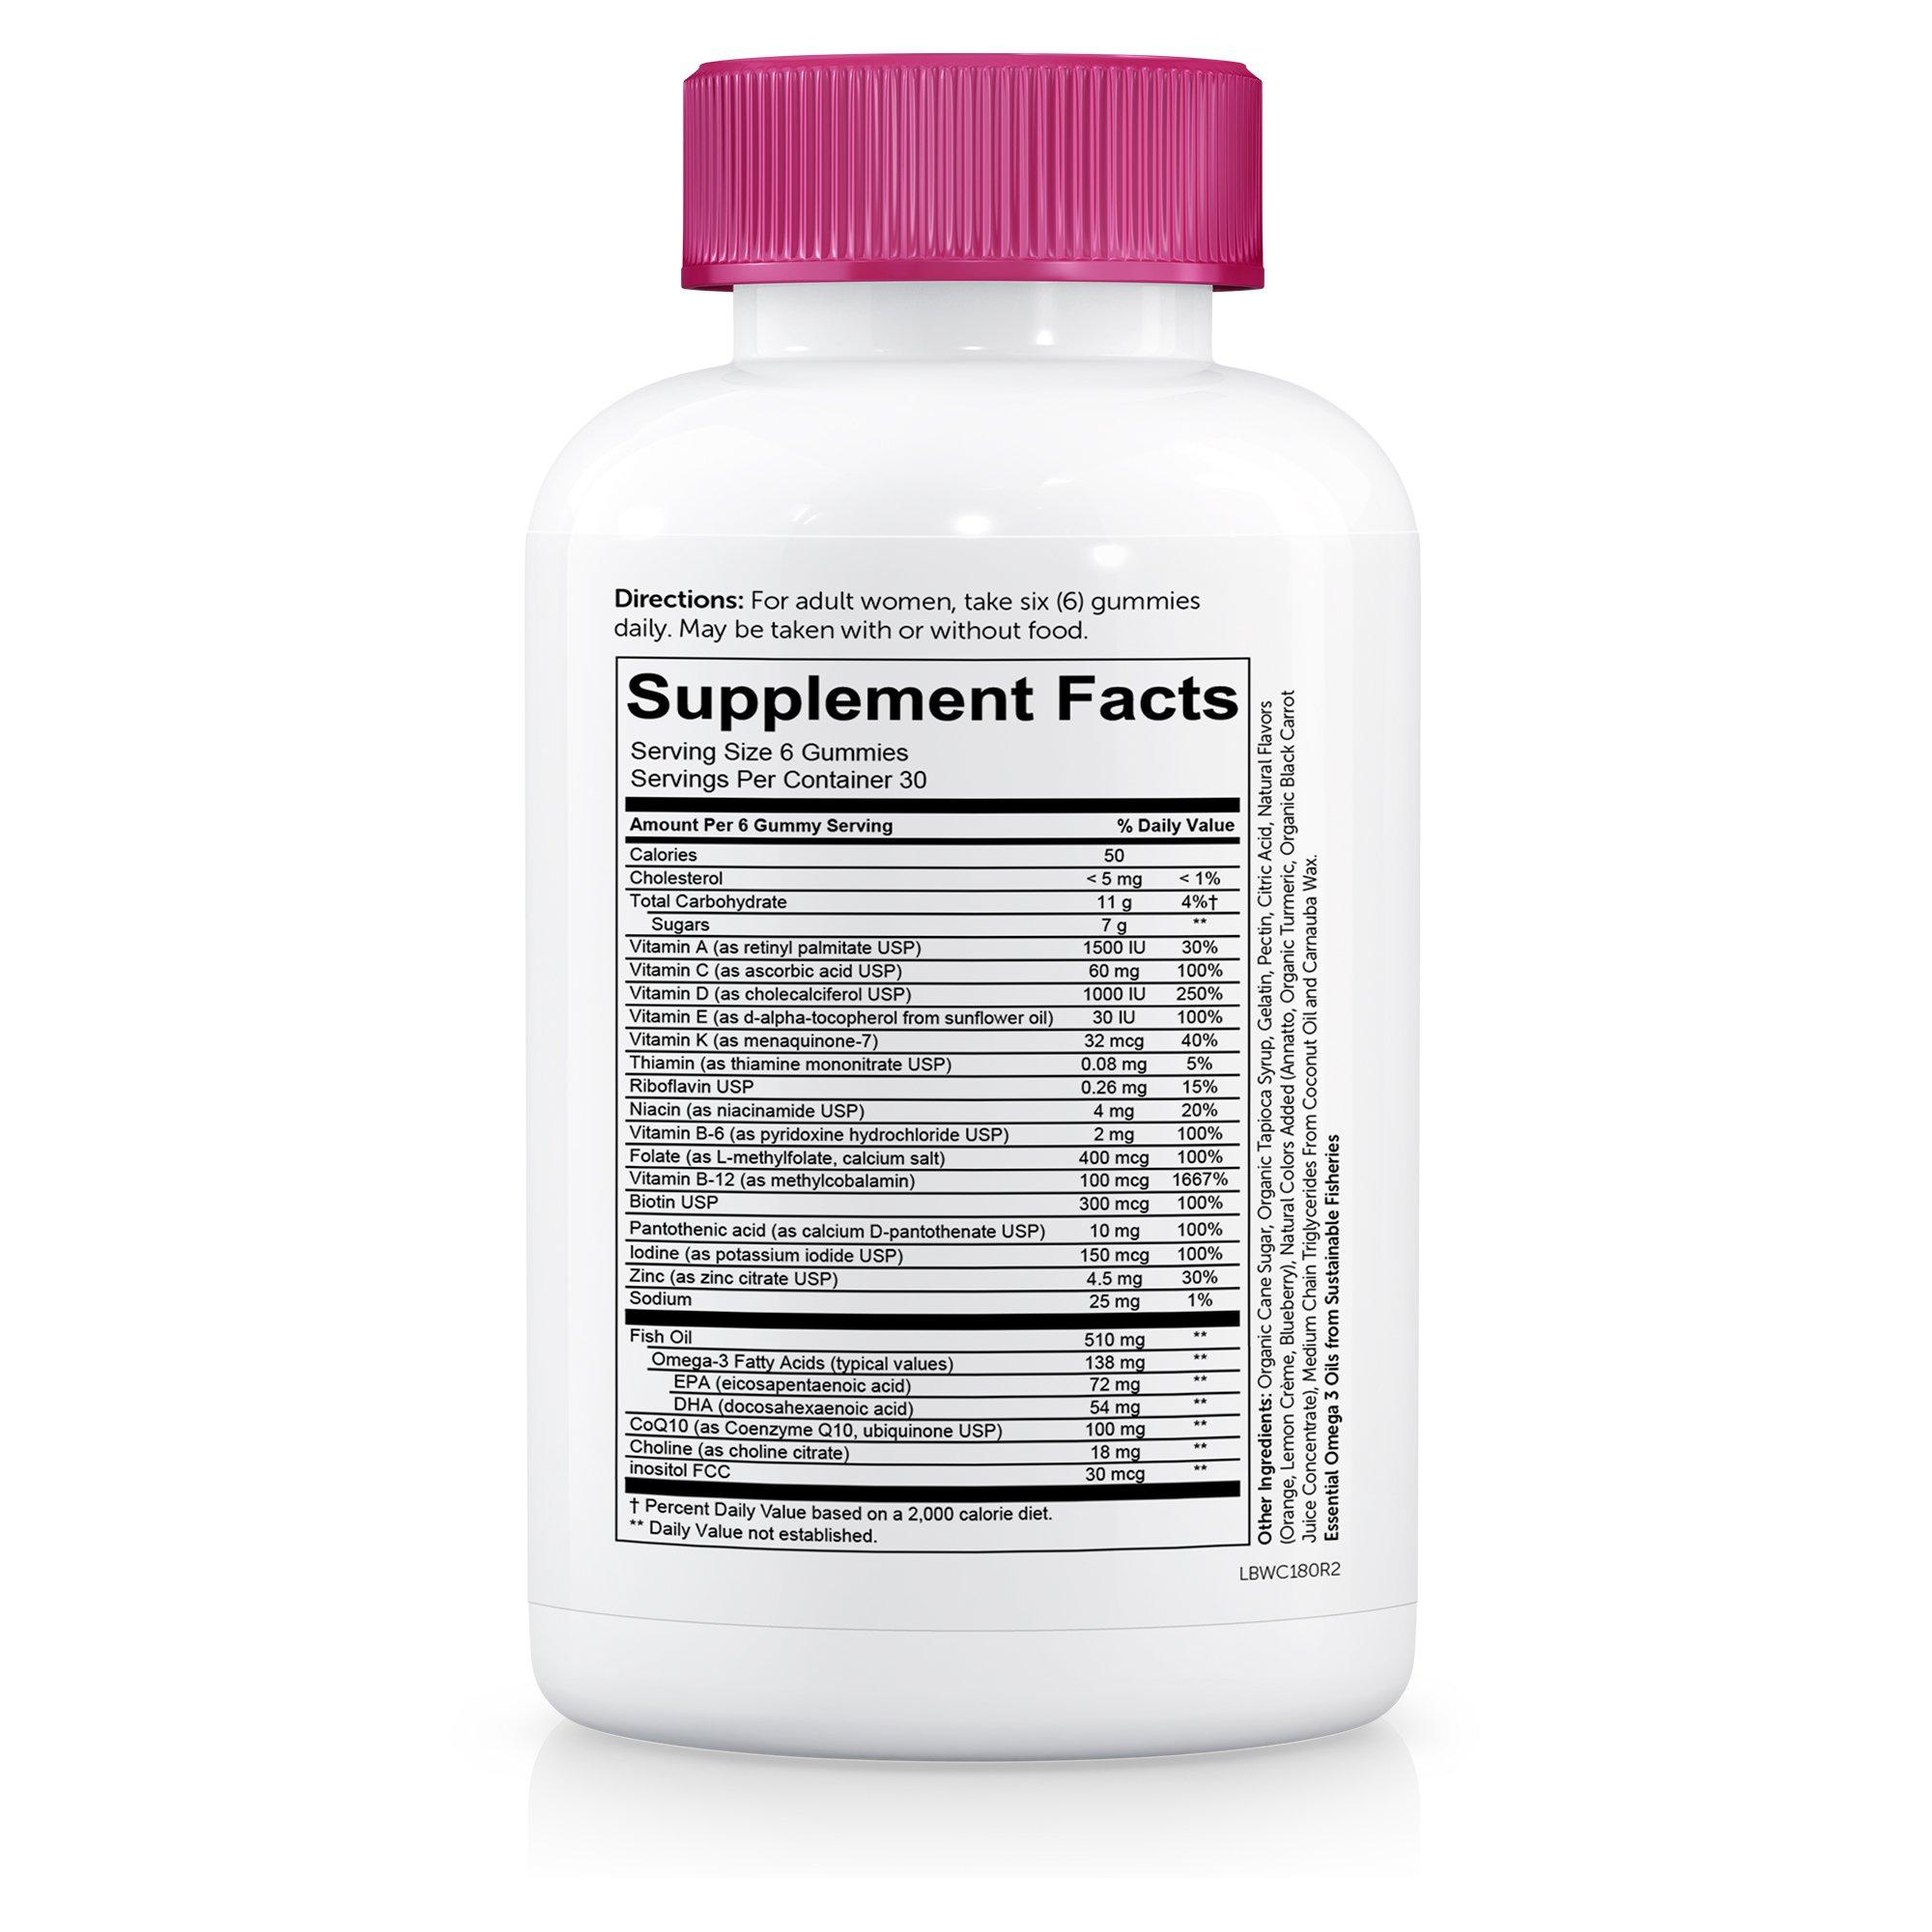 SmartyPants Women's Complete Gummy Vitamins: Gluten Free, Multivitamin, CoQ10, Folate (Methylfolate), Vitamin K2, Vitamin D3, Biotin, Methyl B12, Omega 3 DHA/EPA Fish Oil, 180 count (30 Day Supply) by SmartyPants Gummy Vitamins (Image #5)